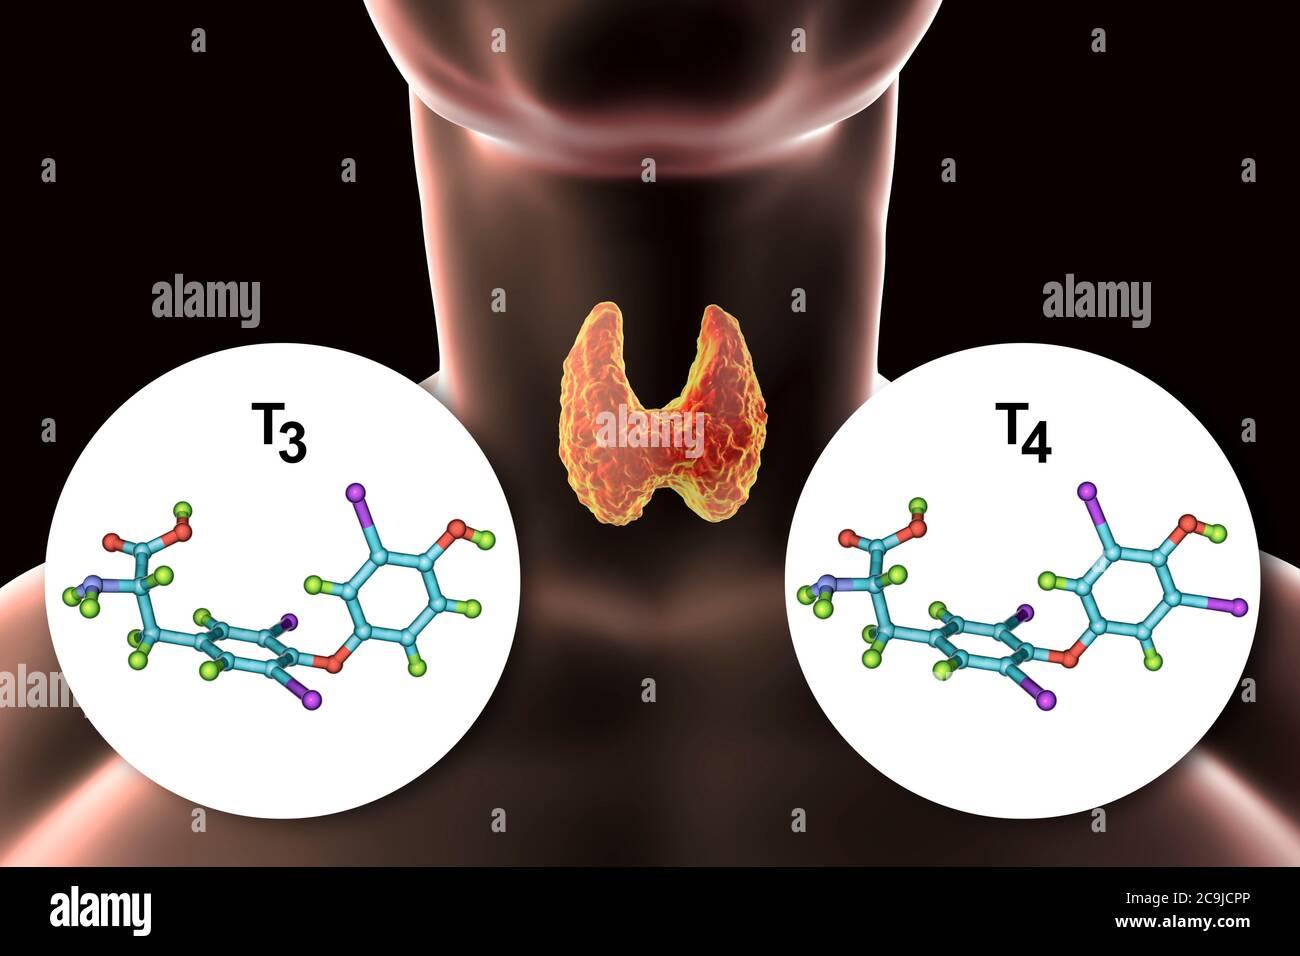 Molecules of thyroid hormones triiodothyronine (T3) and thyroxine (T4), computer illustration. Stock Photo